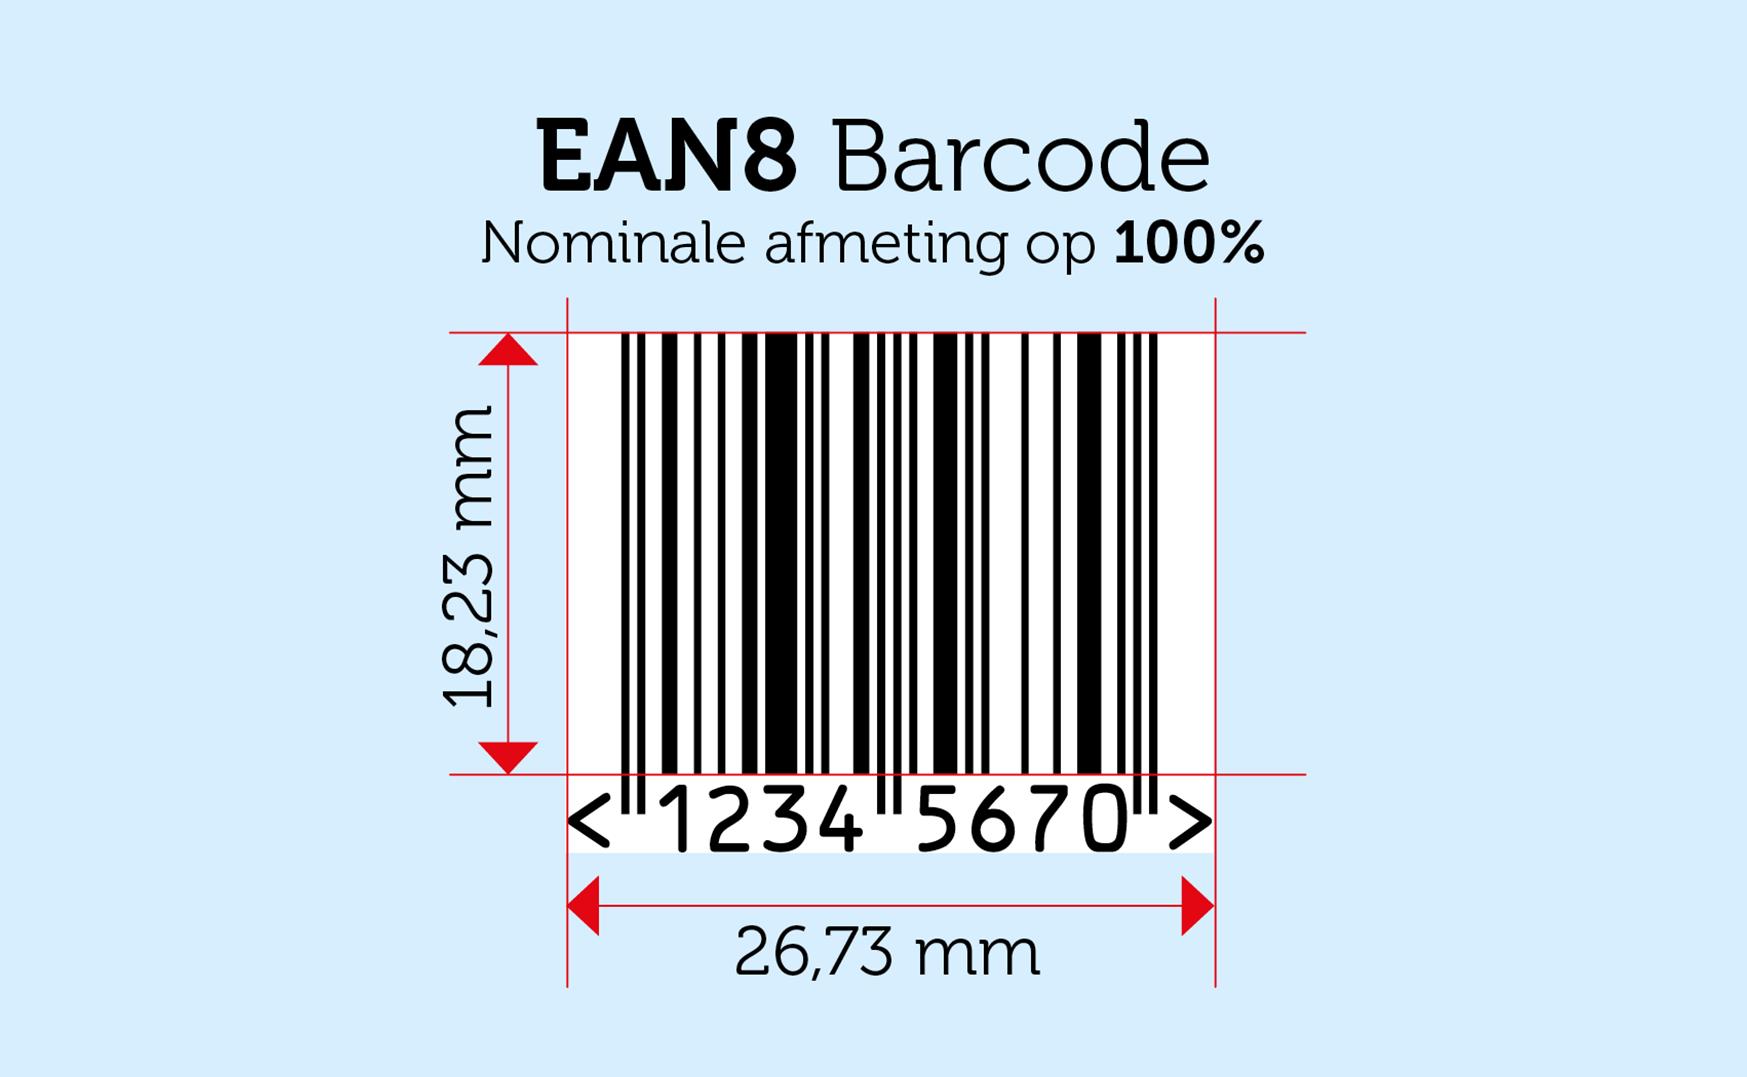 ean 8 barcode nummer afbeelding